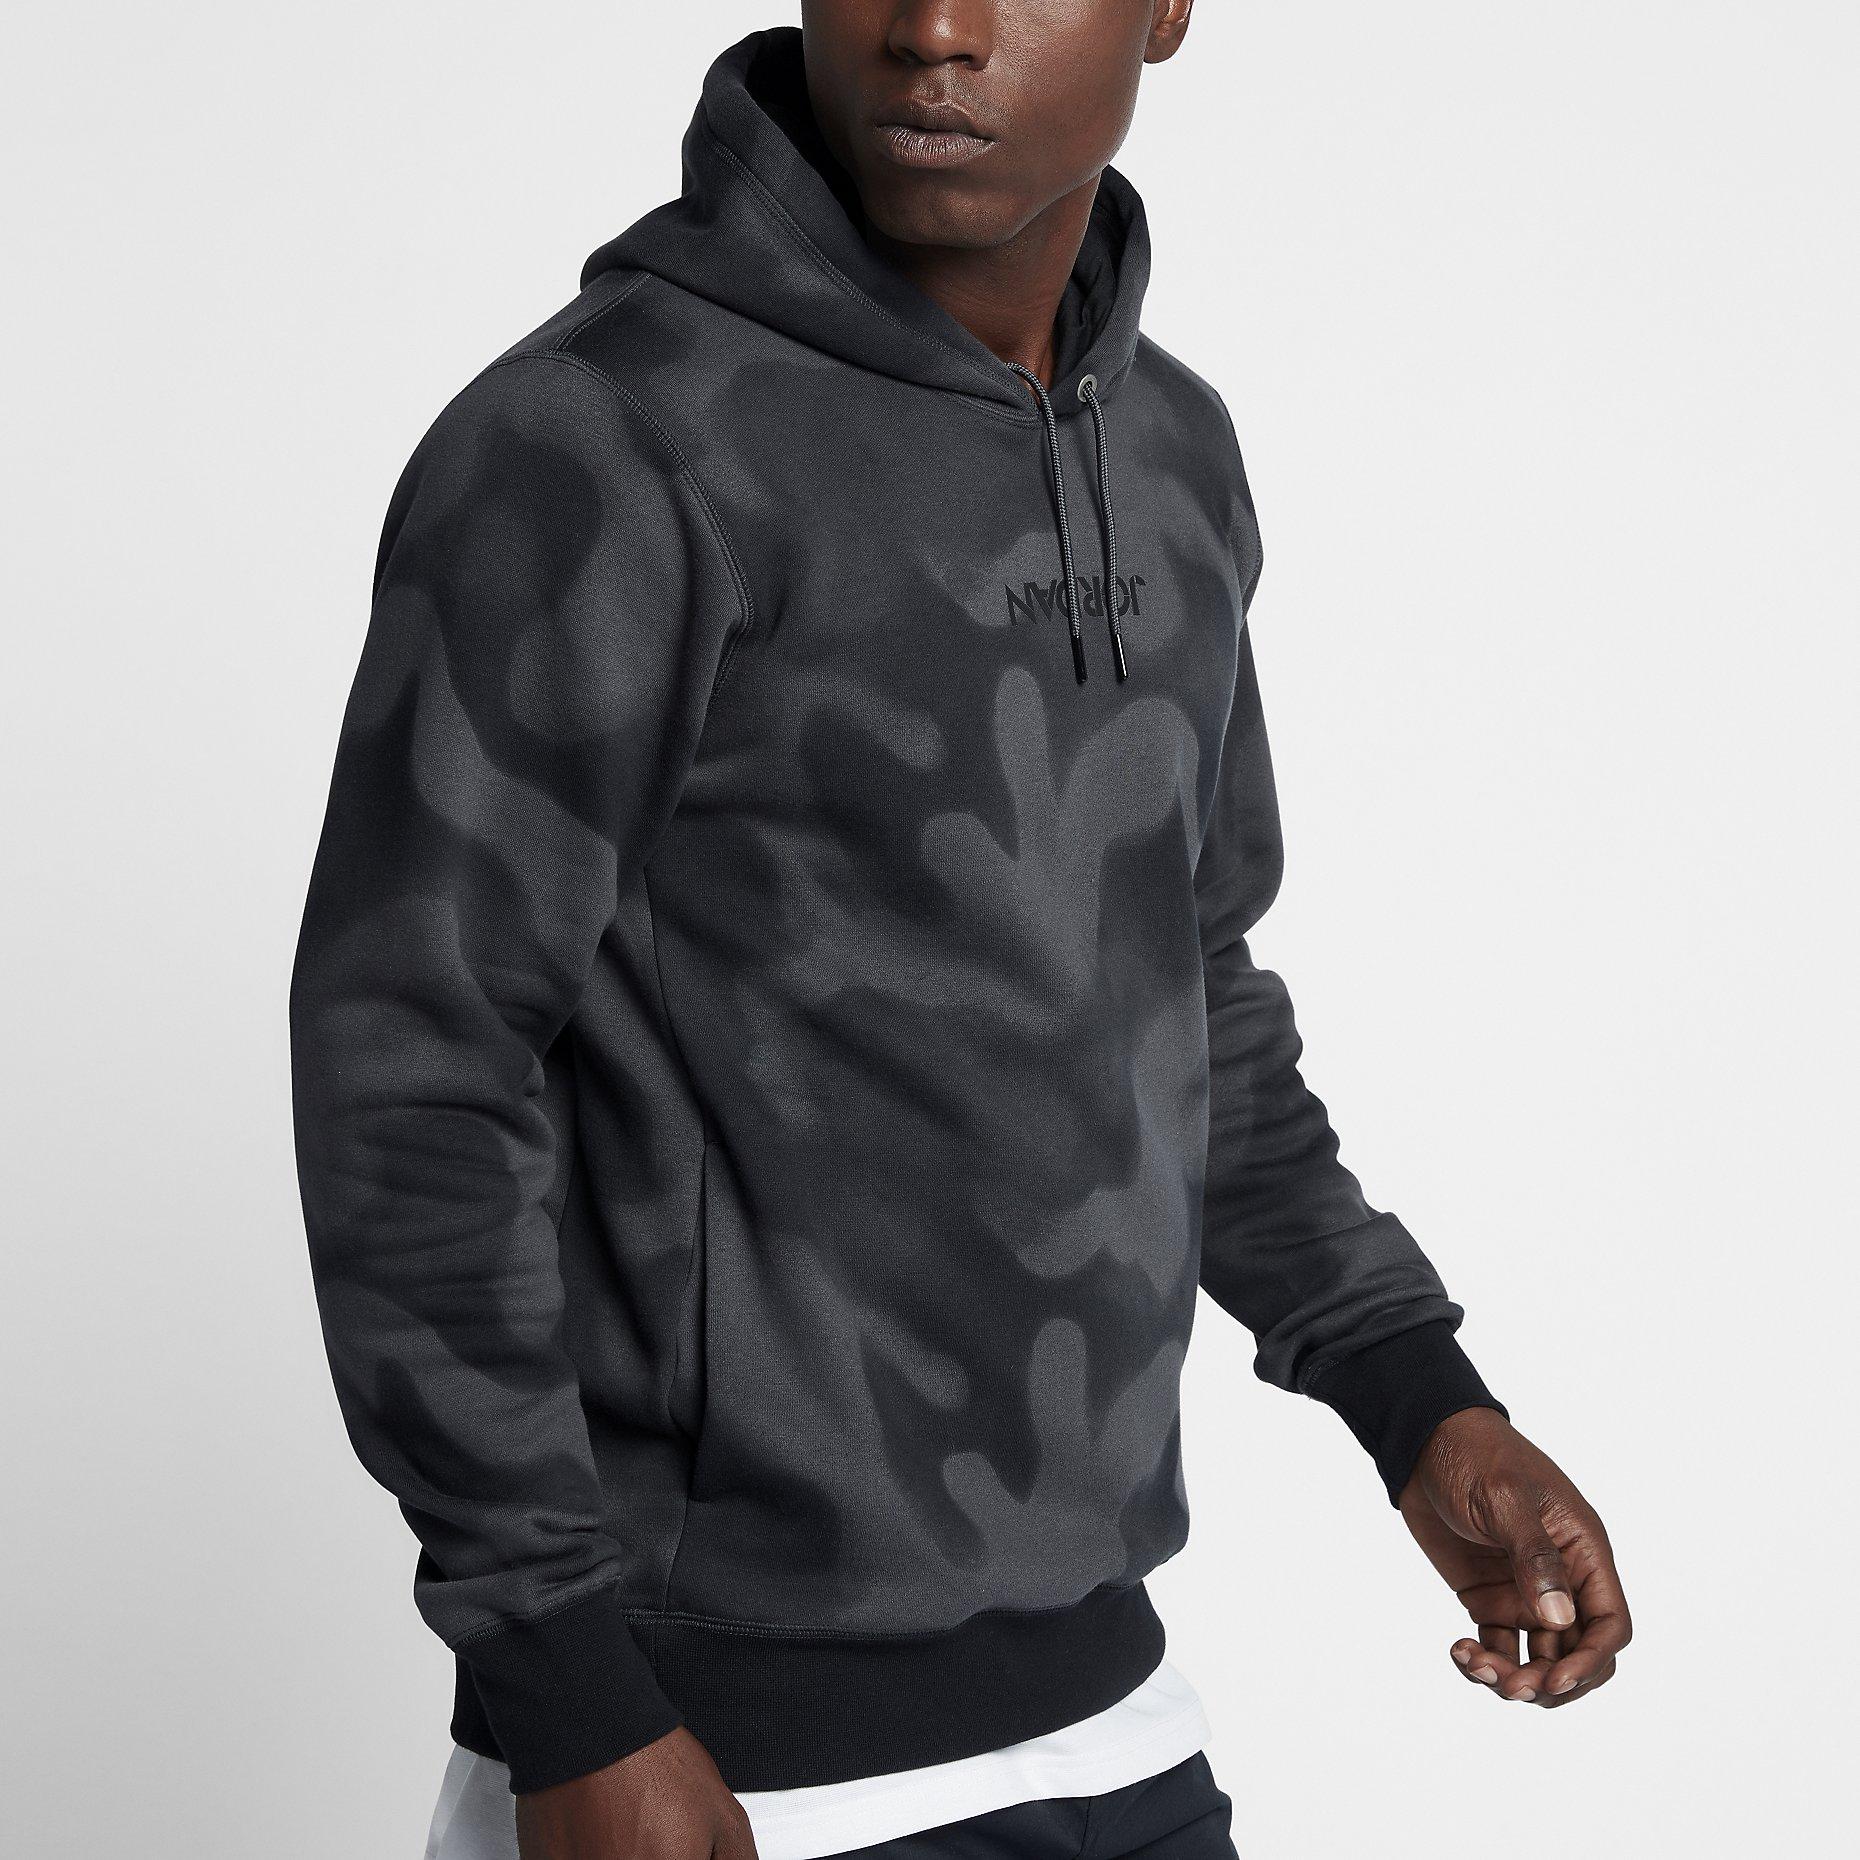 jordan-sportswear-p51-flight-mens-fleece-pullover-hoodie.jpg